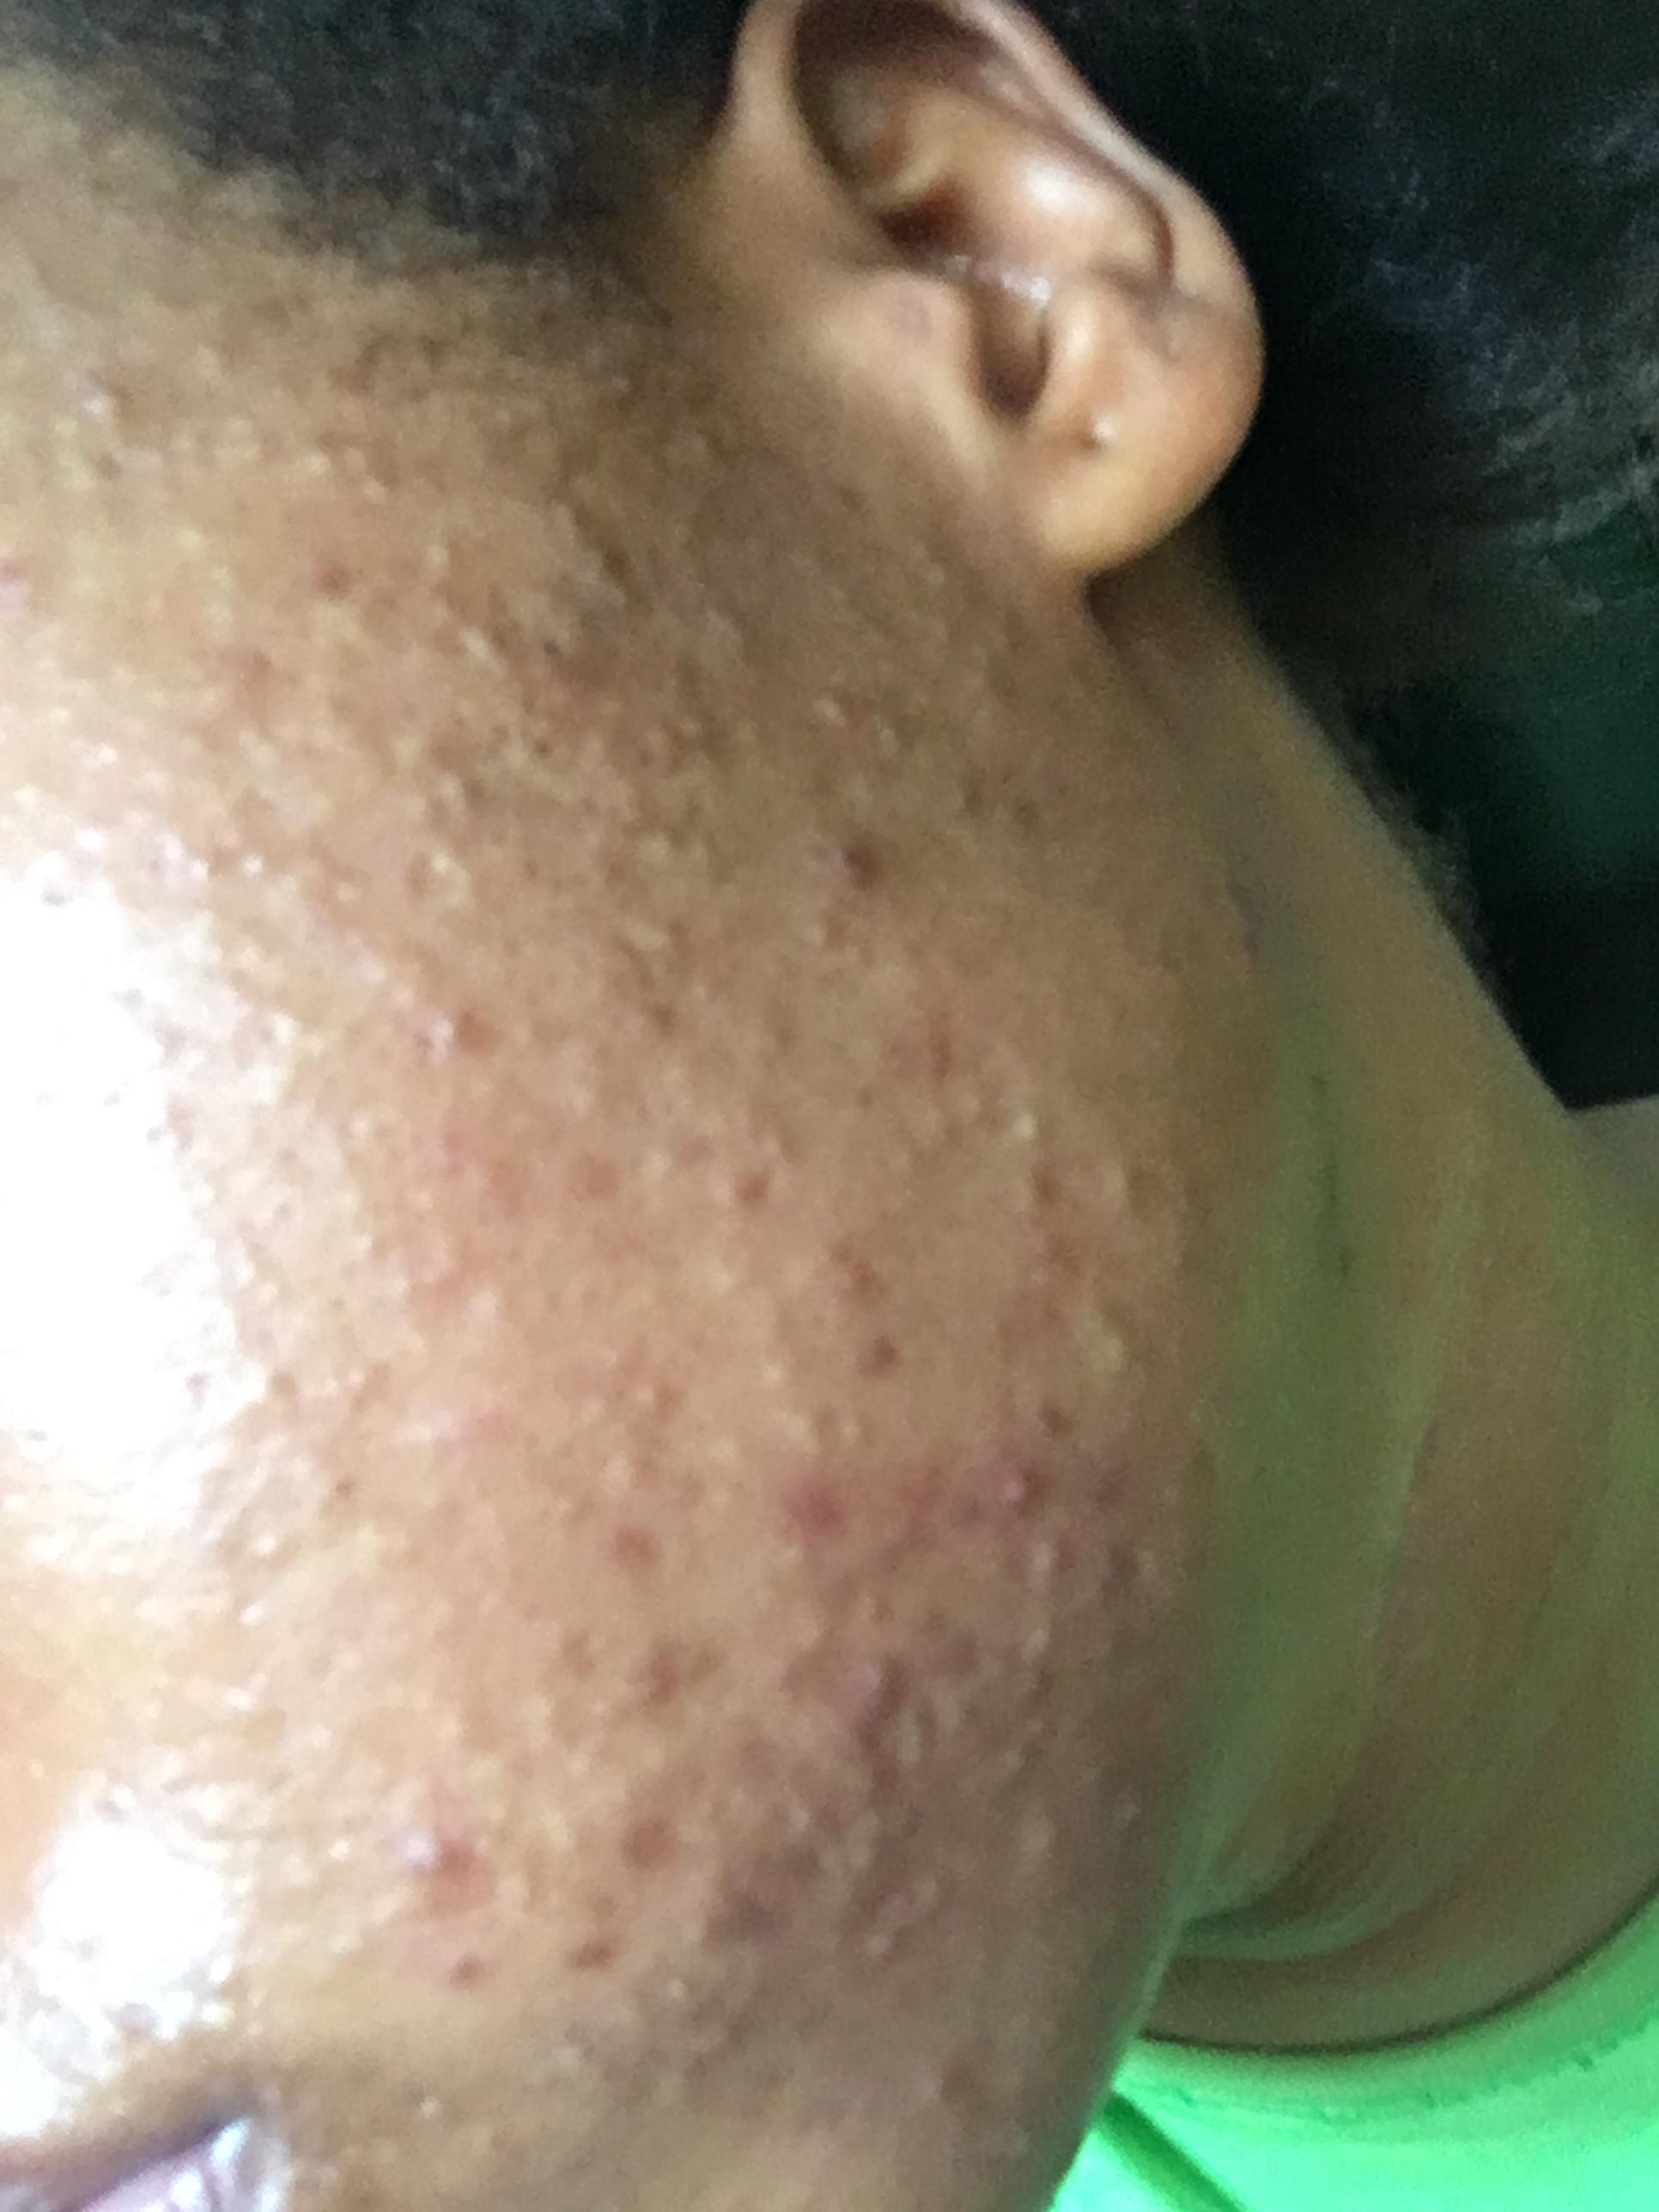 pimple keeps refilling